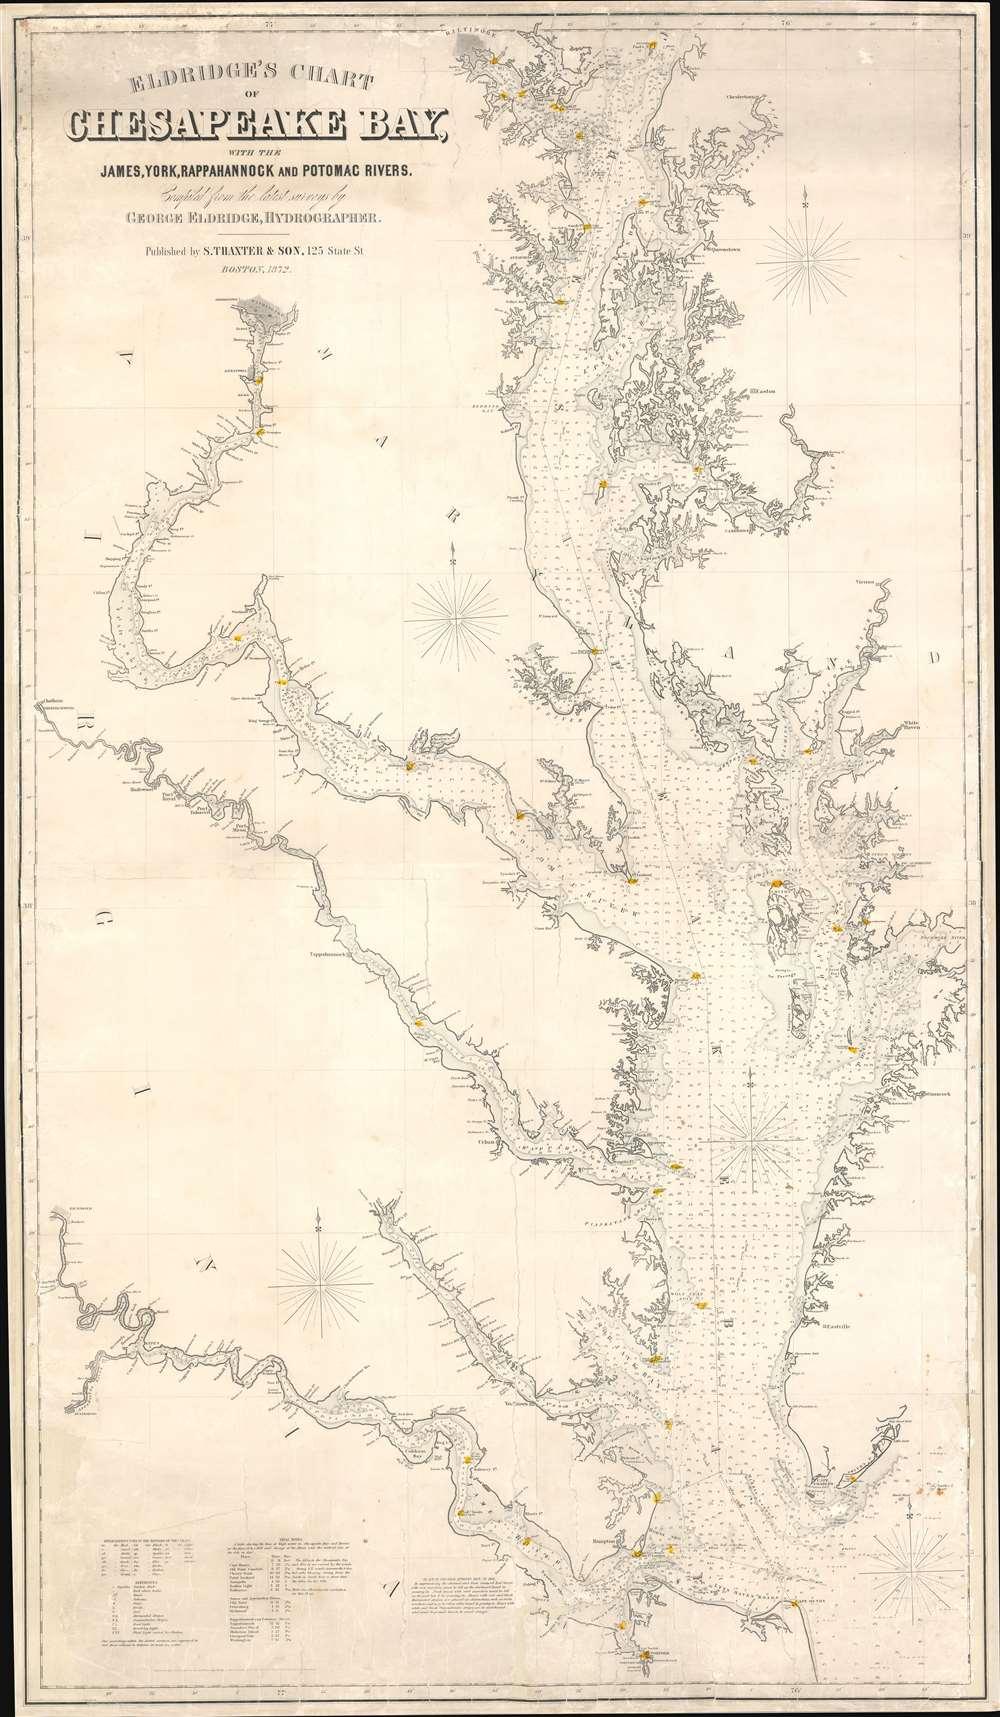 Eldridge's Chart of Chesapeake Bay, with the James, York, Rappahannock and Potomac Rivers. - Main View